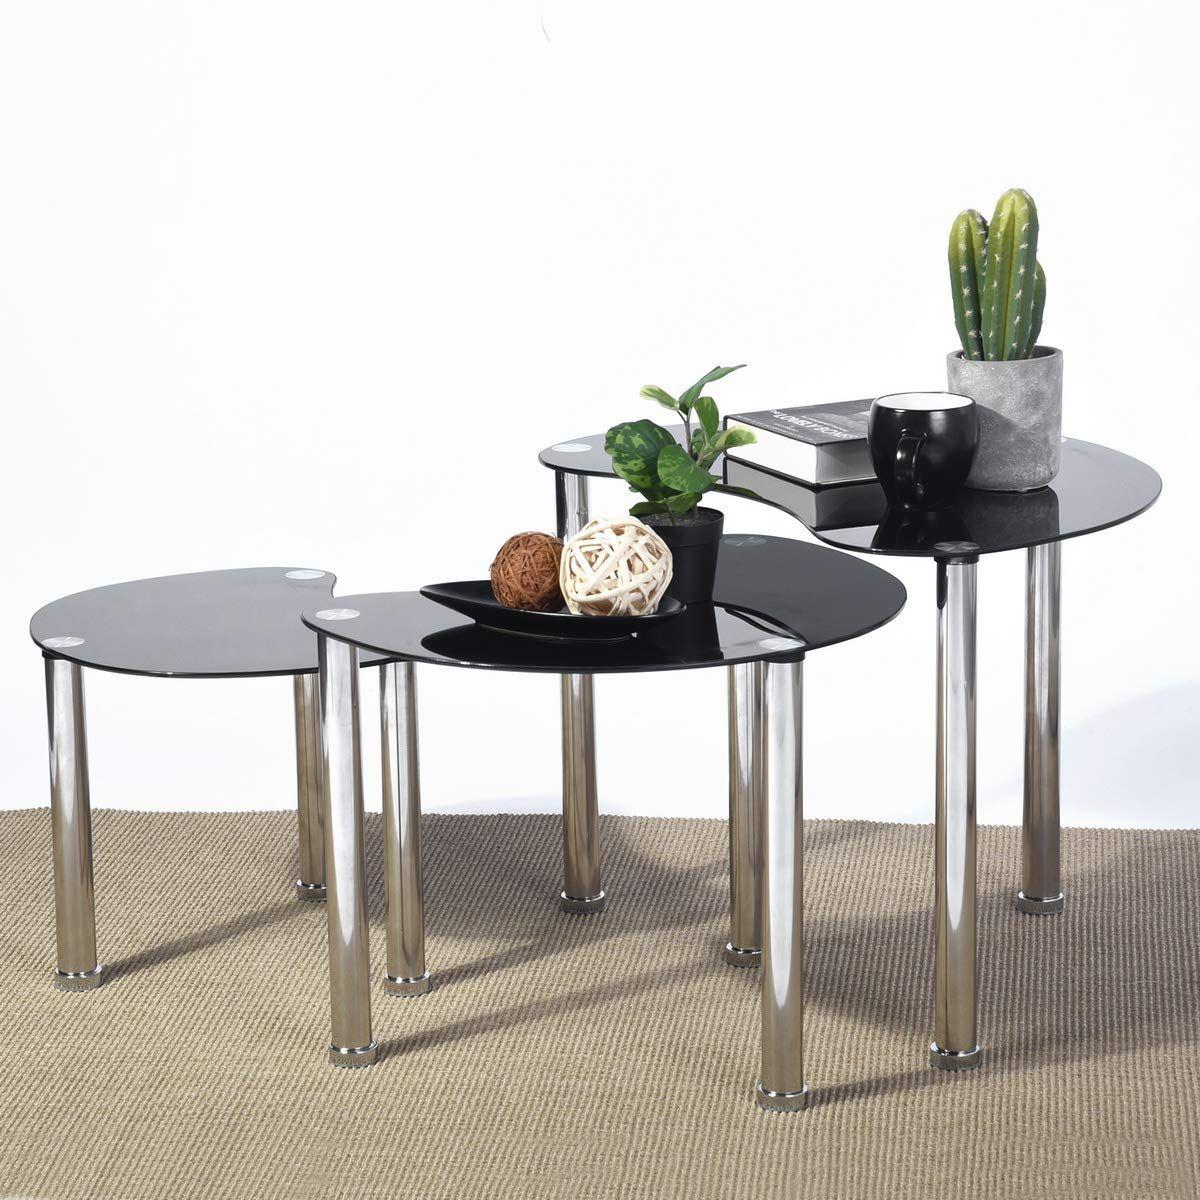 Aingoo Glass Nesting Coffee Table Set of 3